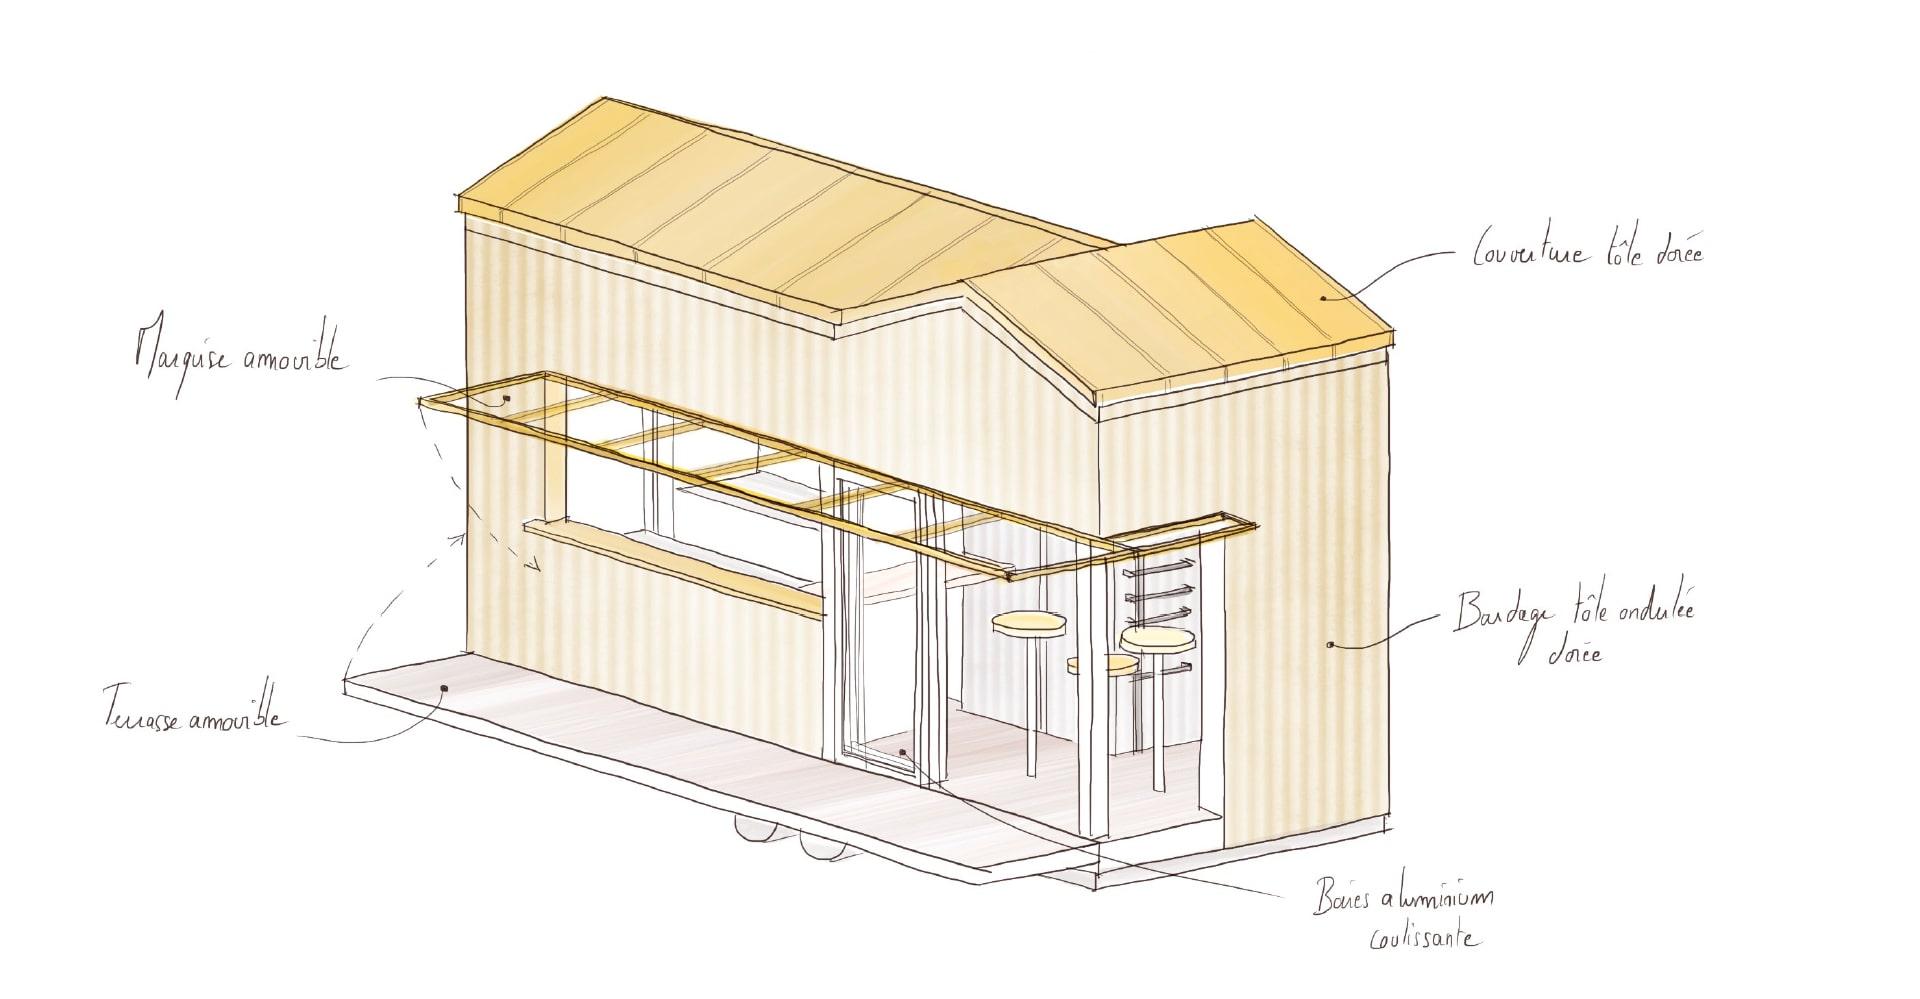 tiny-house-model-food-truck